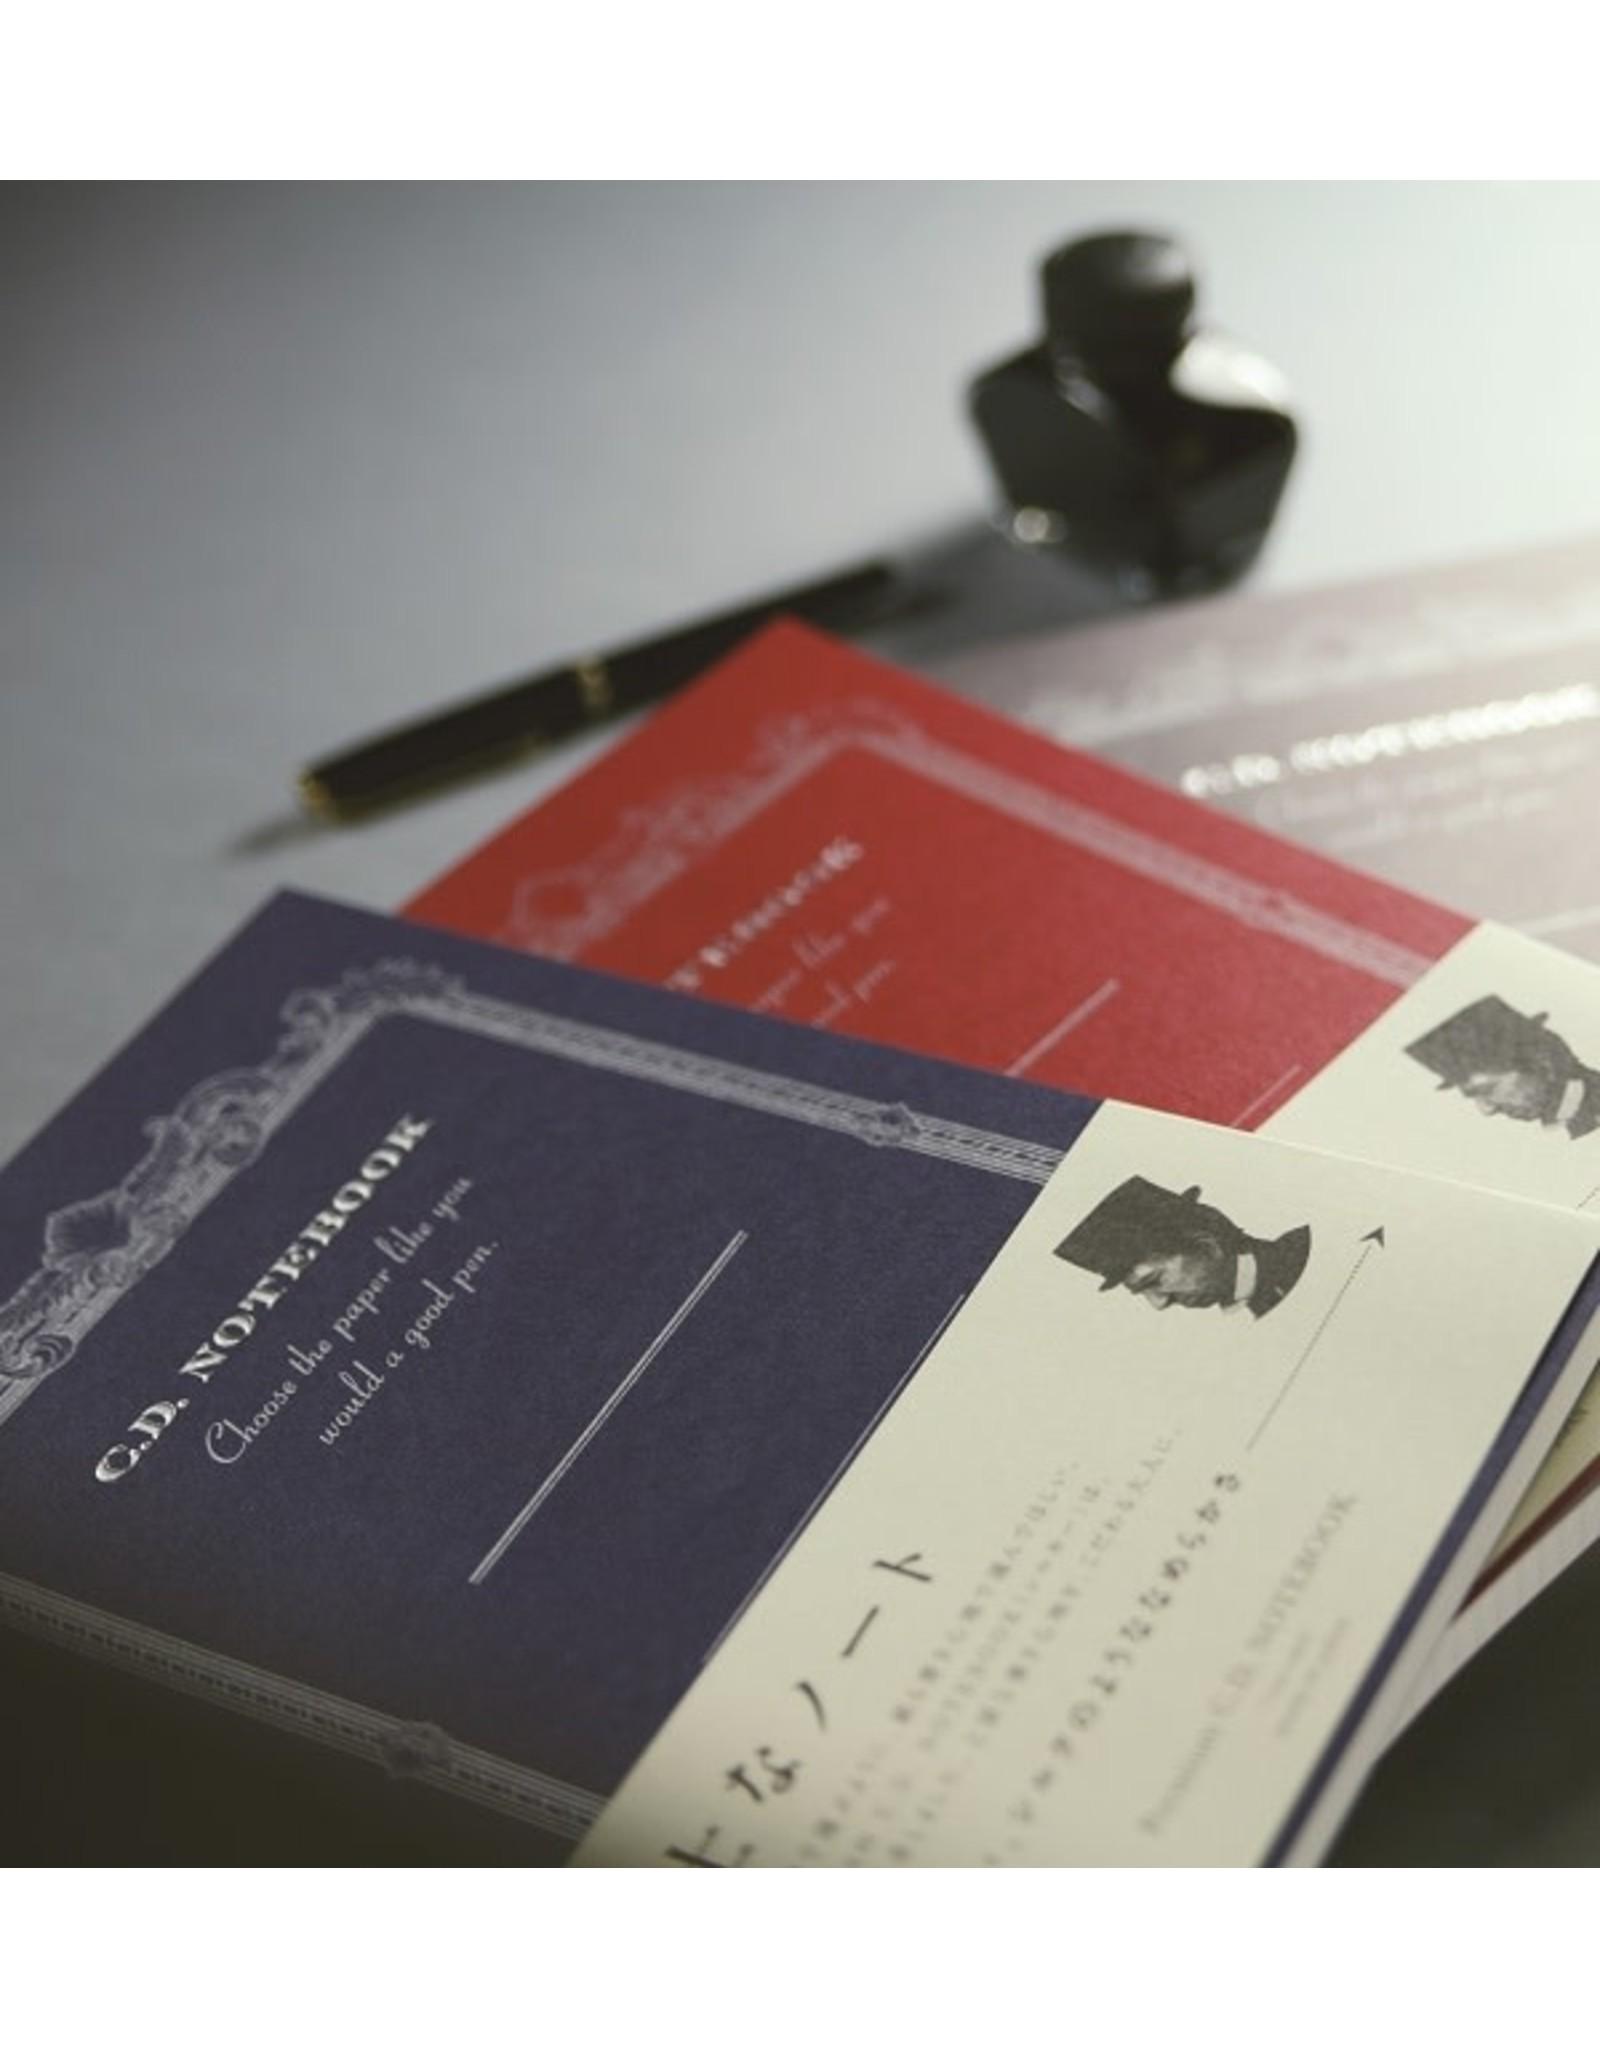 APICA Co., Ltd. PREMIUM CD NOTEBOOK A5 GRID CREAM 96PAGES